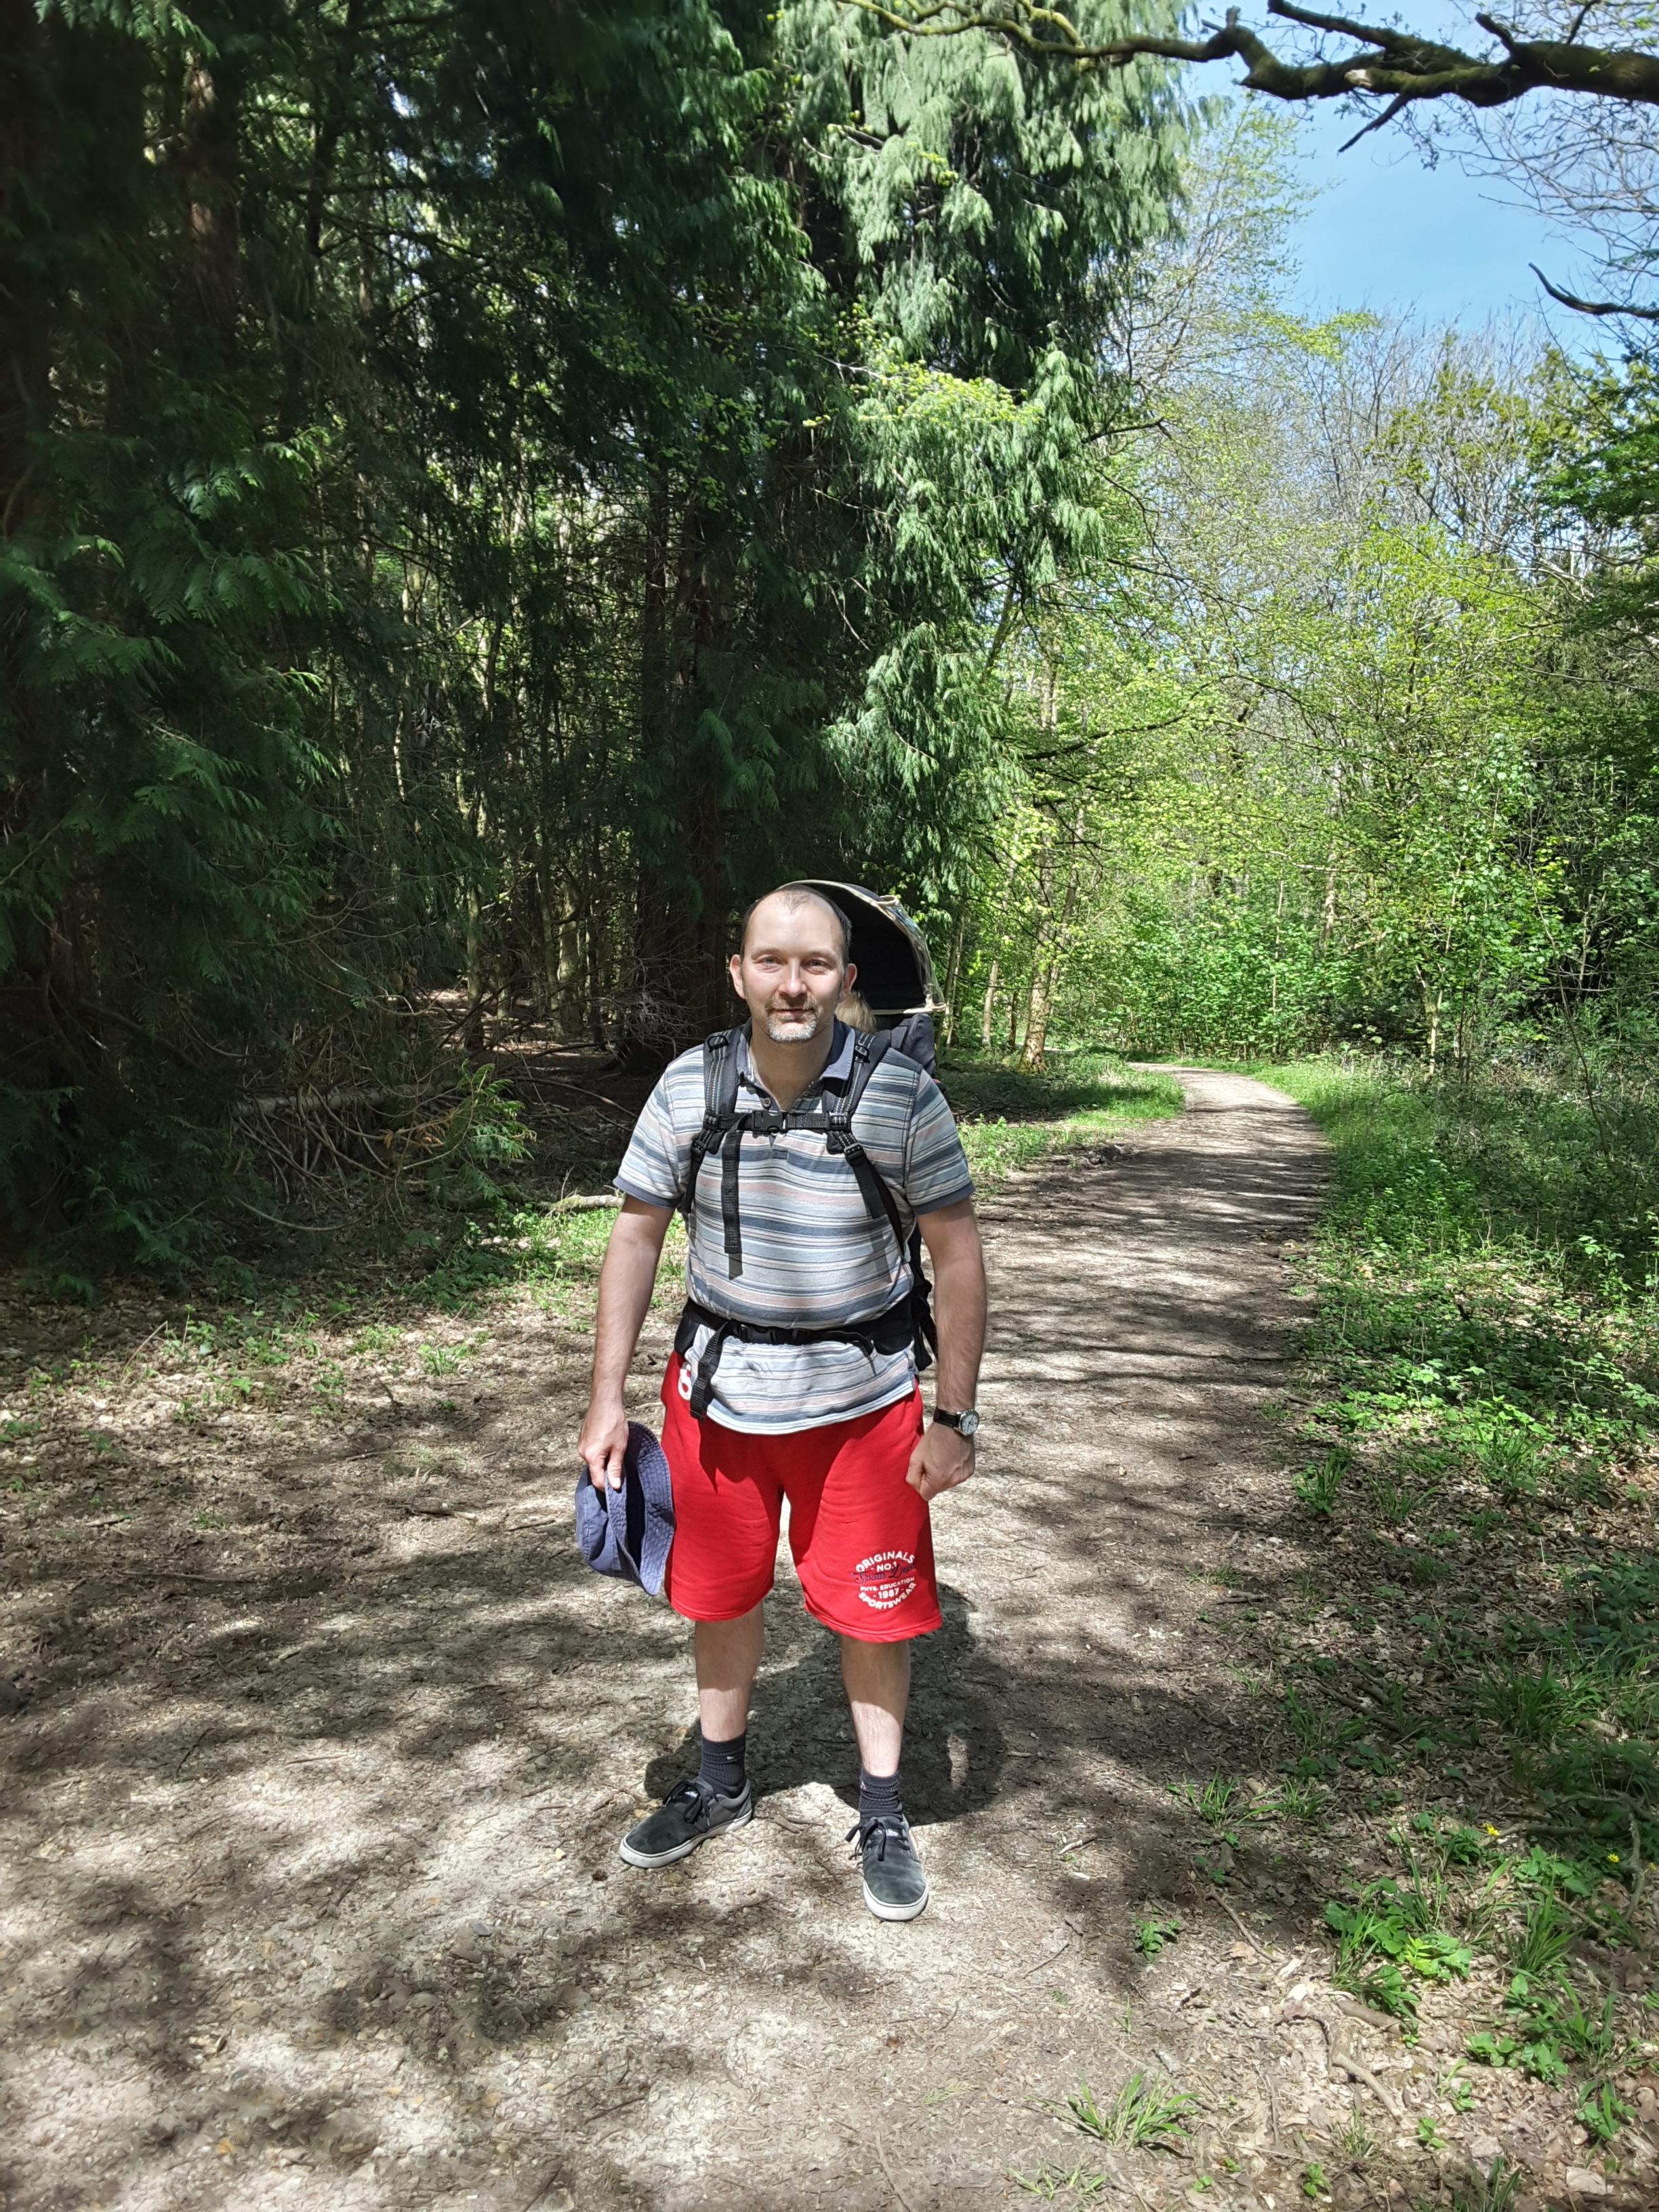 2016.05.08 - Kingley Vale National Nature Reserve - 06